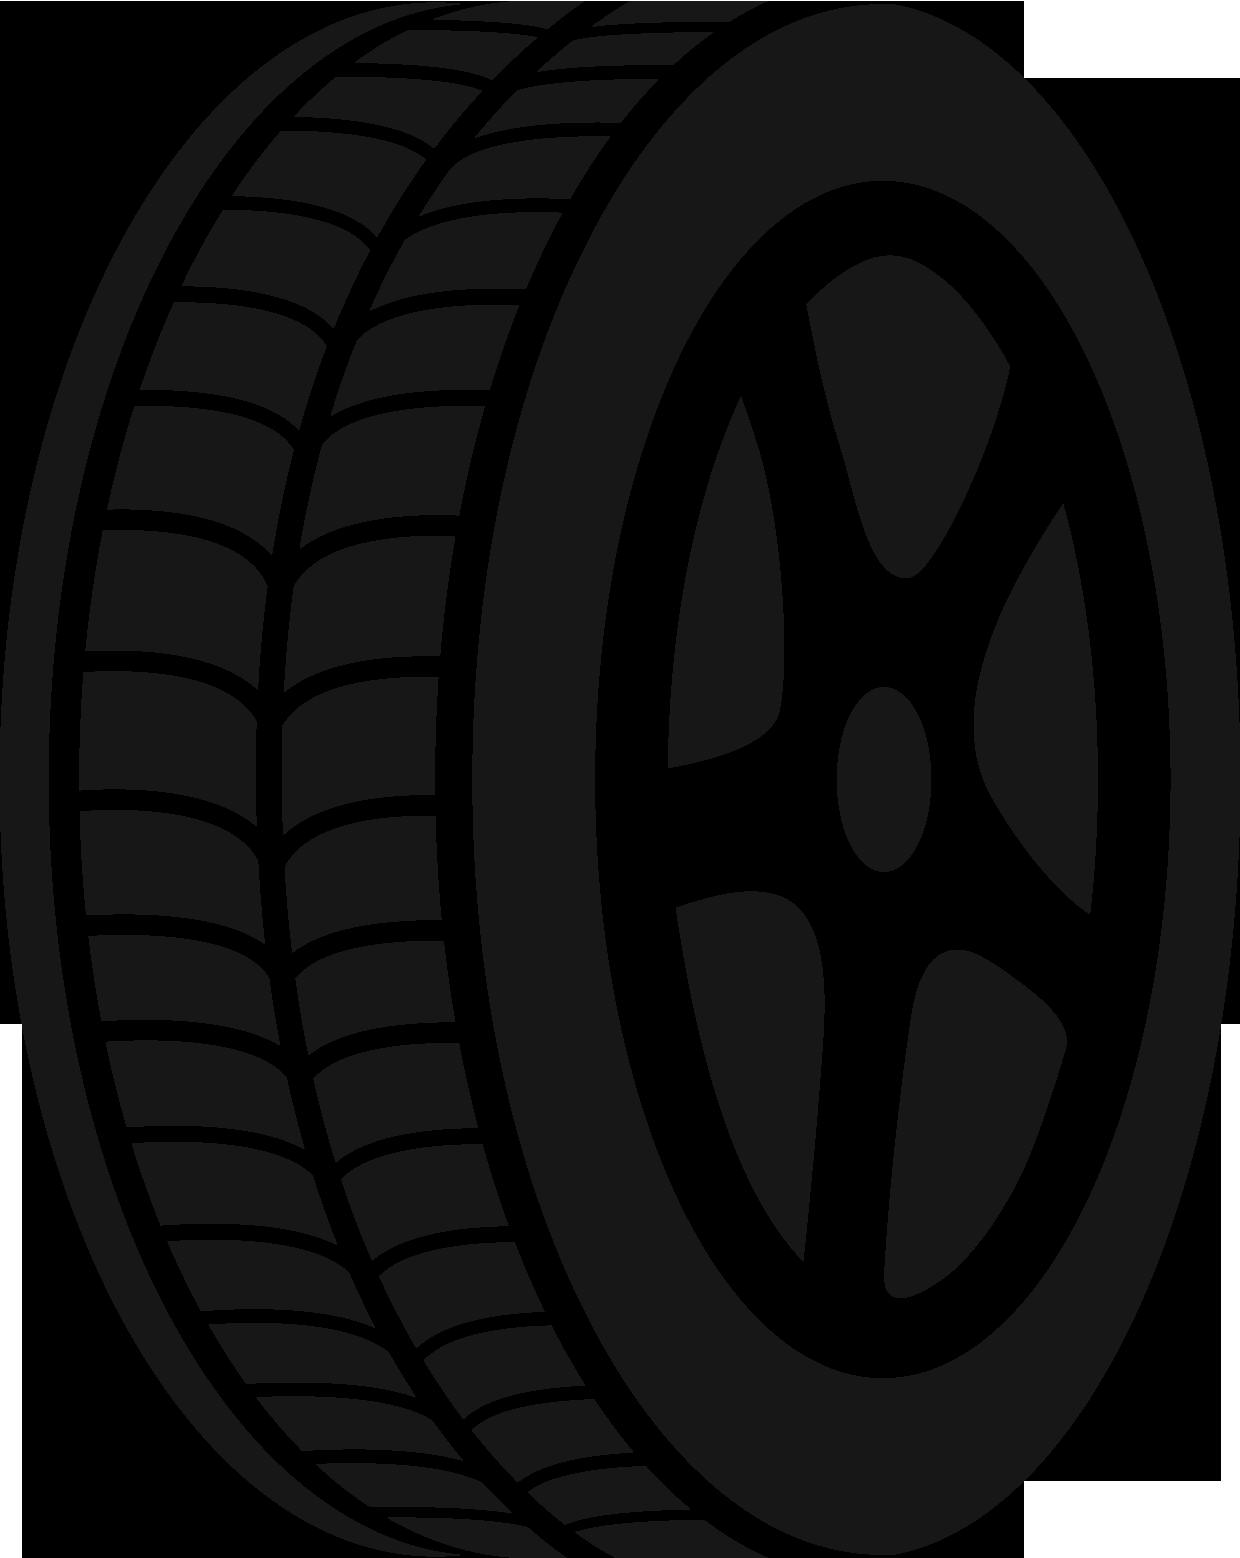 Track clipart truck tire track, Picture